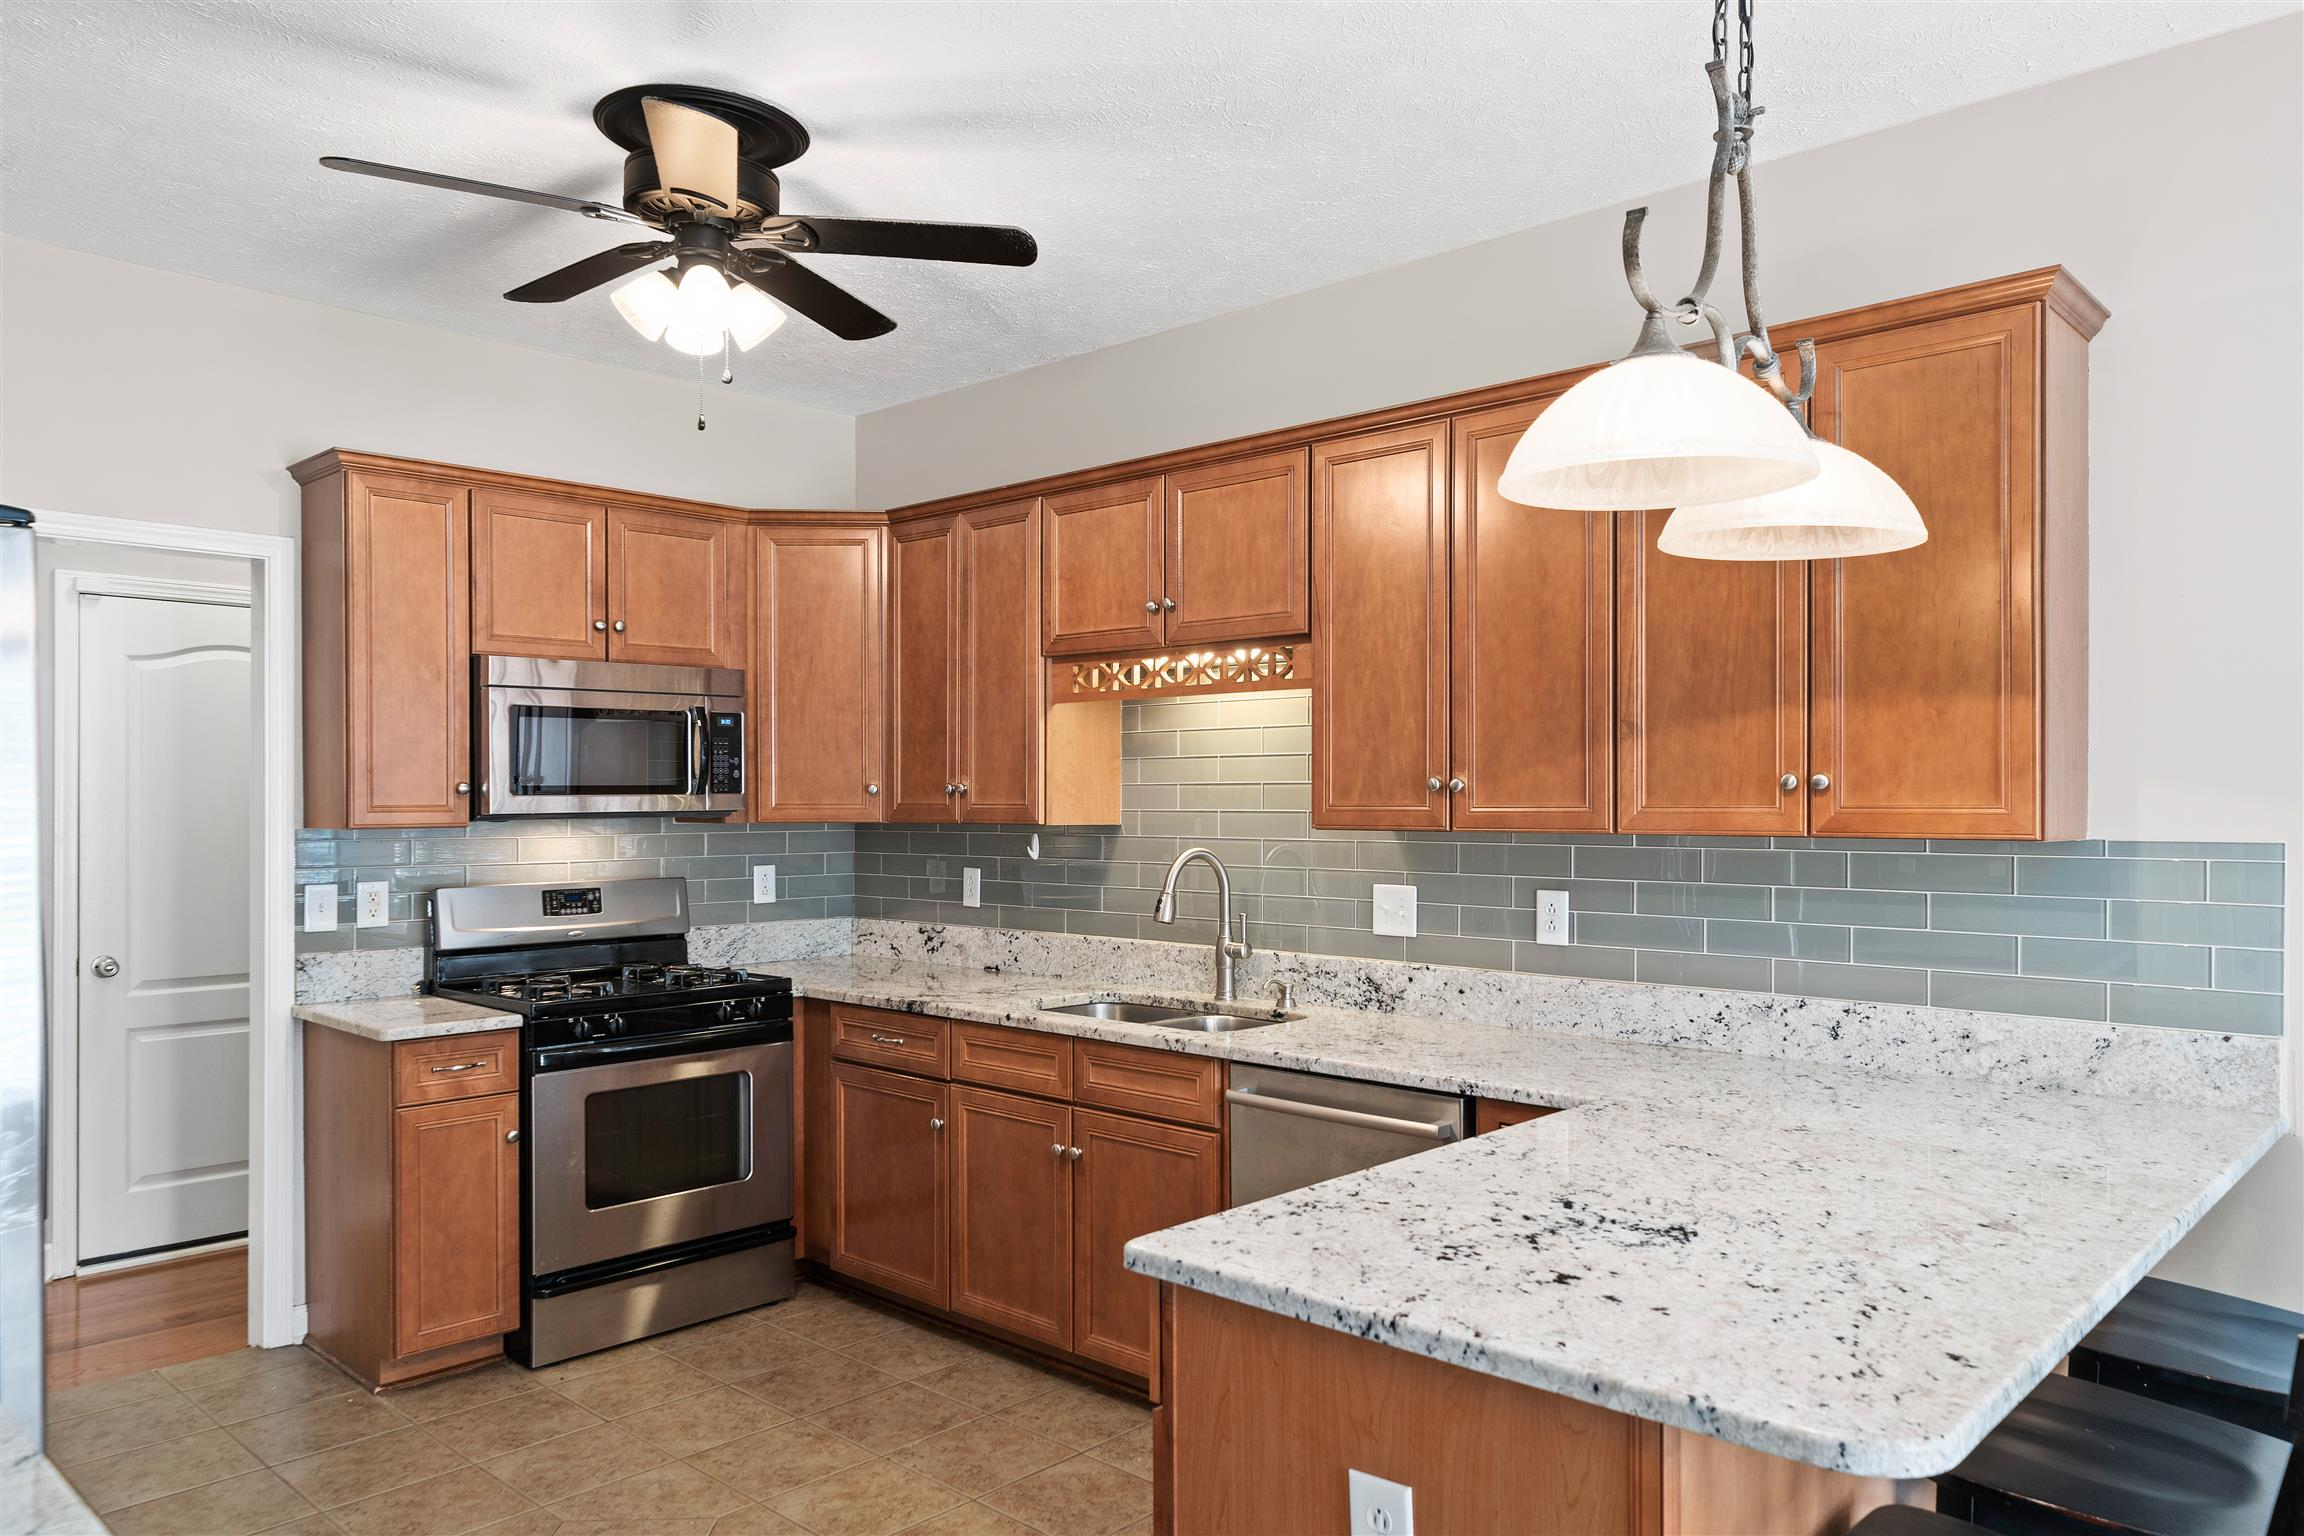 1137 Winding Creek Ct, Clarksville, TN 37043 - Clarksville, TN real estate listing